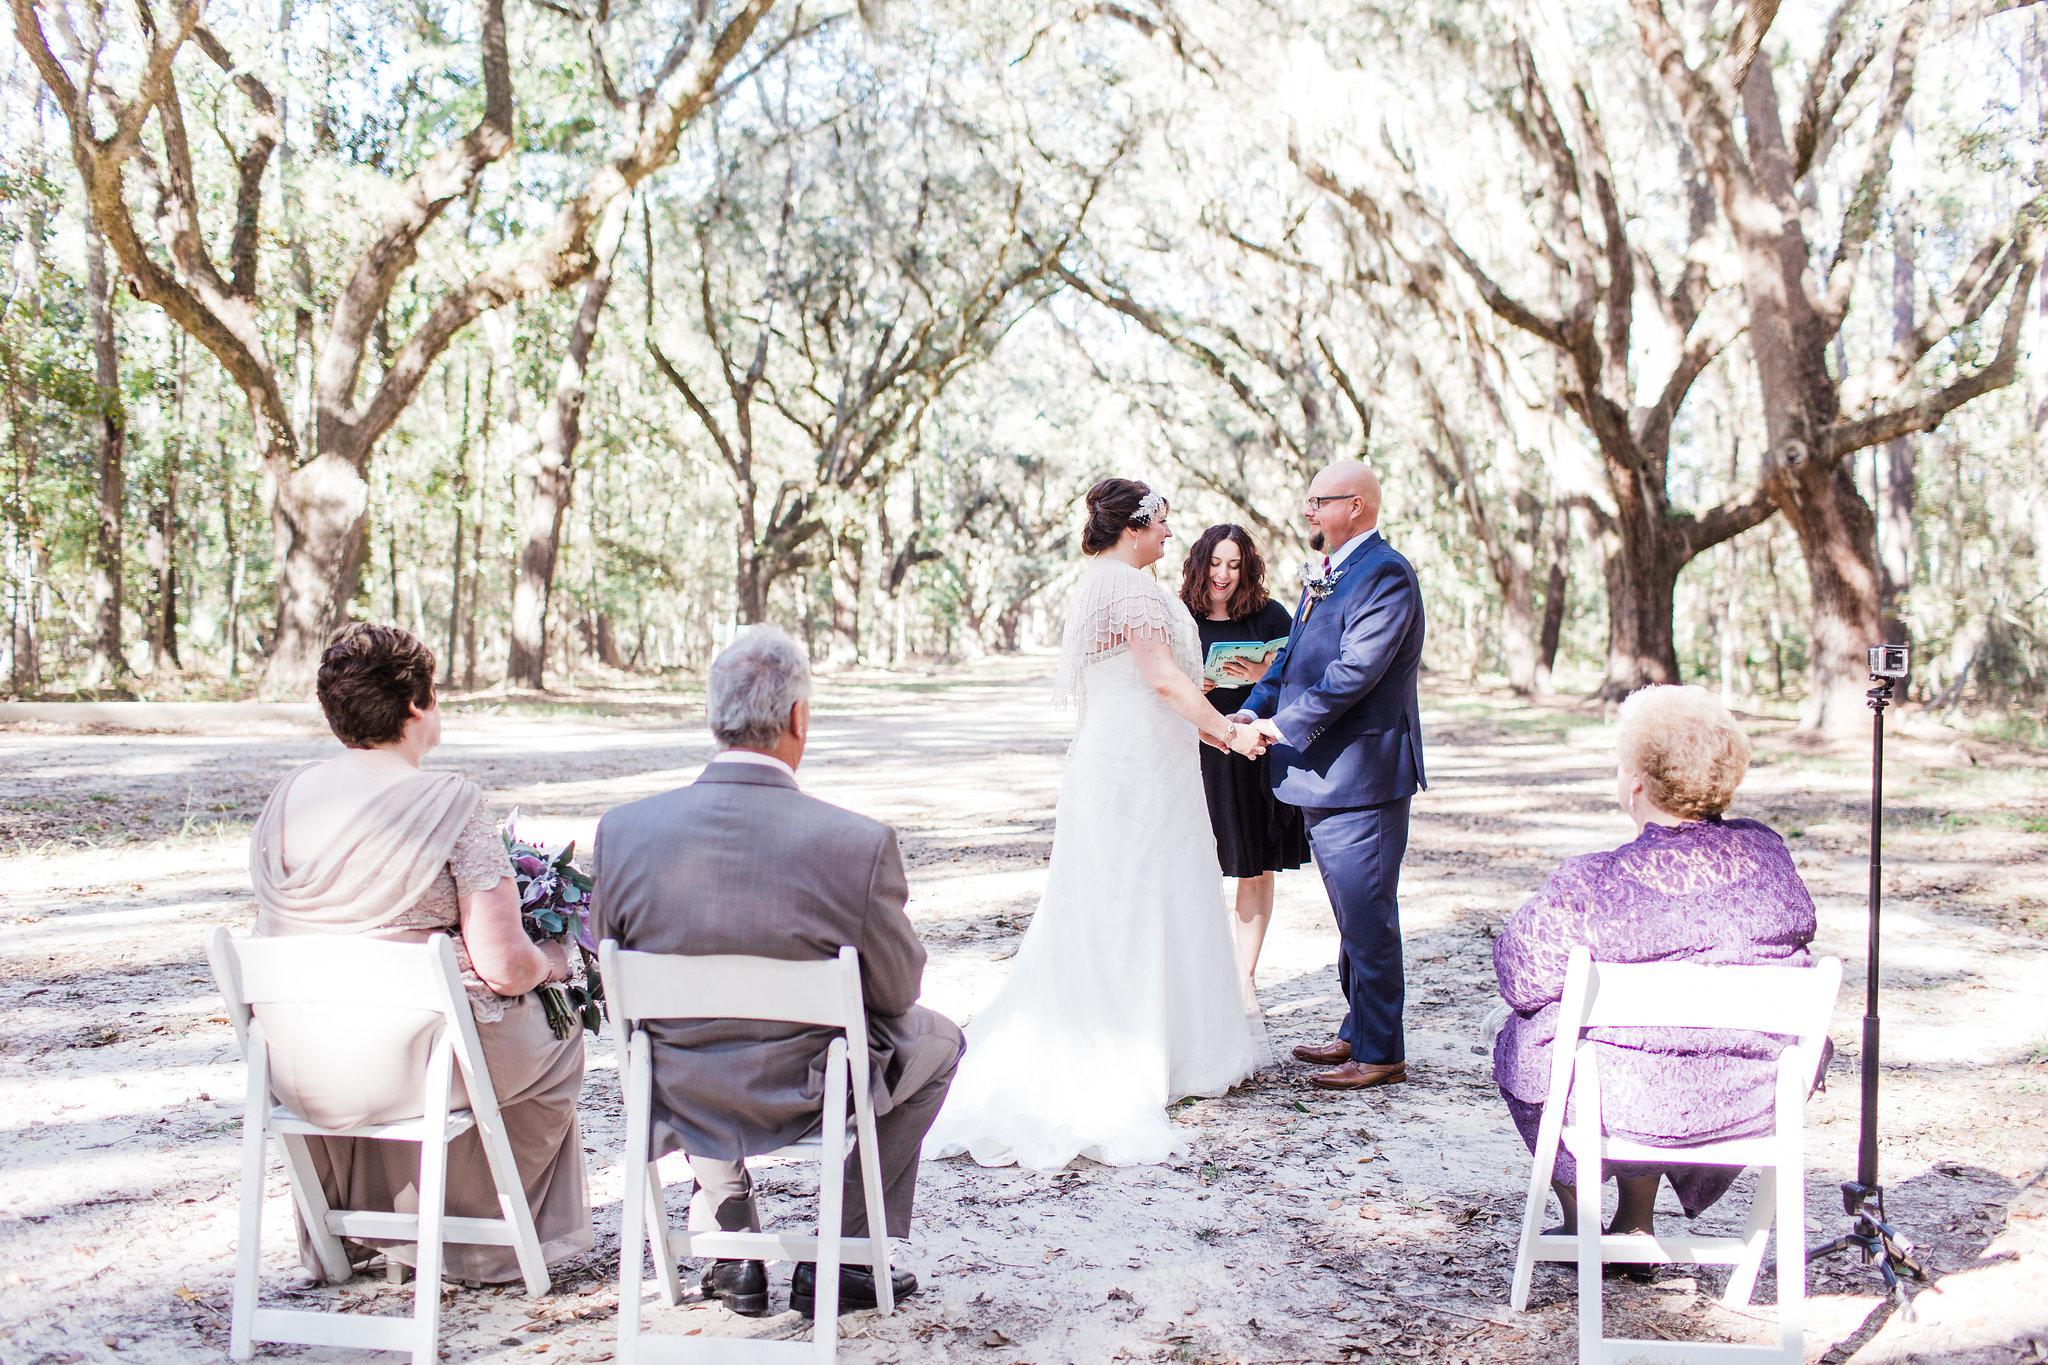 apt-b-photography-kristy-rob-wormsloe-elopment-savannah-wedding-photographer-savannah-elopement-wormsloe-wedding-historic-savannah-elopement-photographer-17.jpg